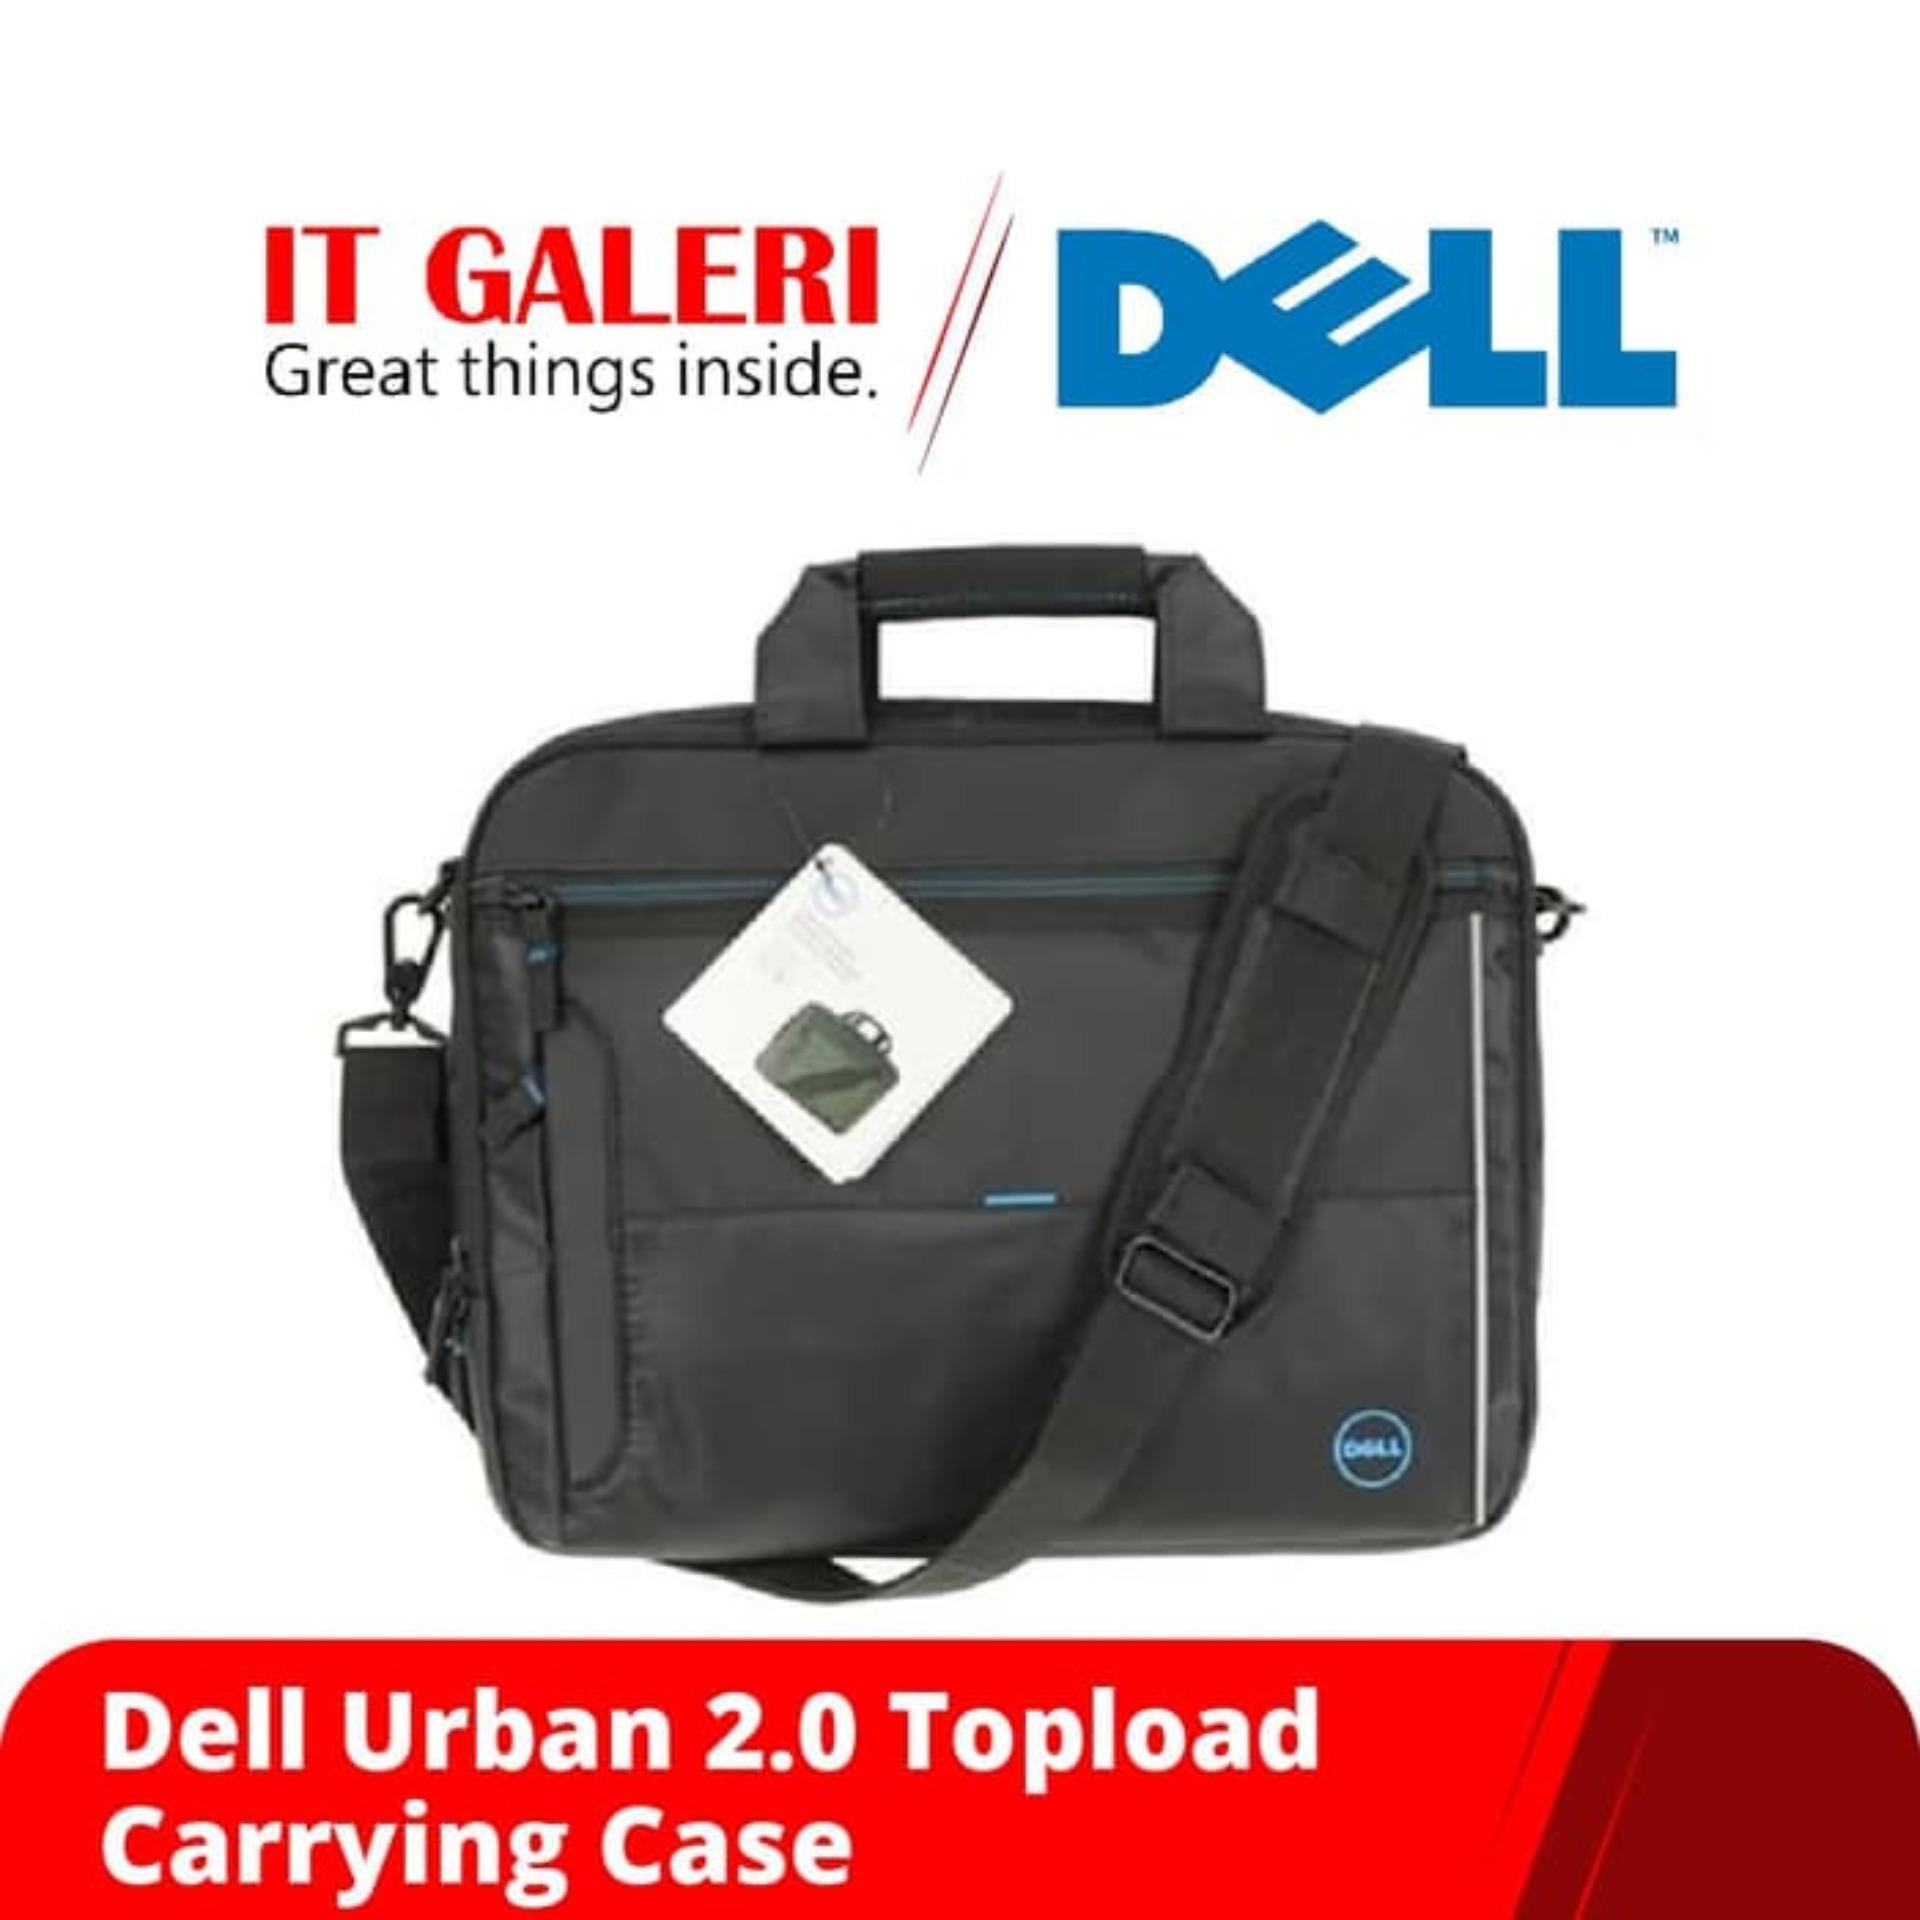 "Tas Bag Notebook Laptop 14""-15"" ORIGINAL Merk HP Elegant. Rp395.000. DKI Jakarta. Dell Urban 2.0 Topload Carrying Case Original"